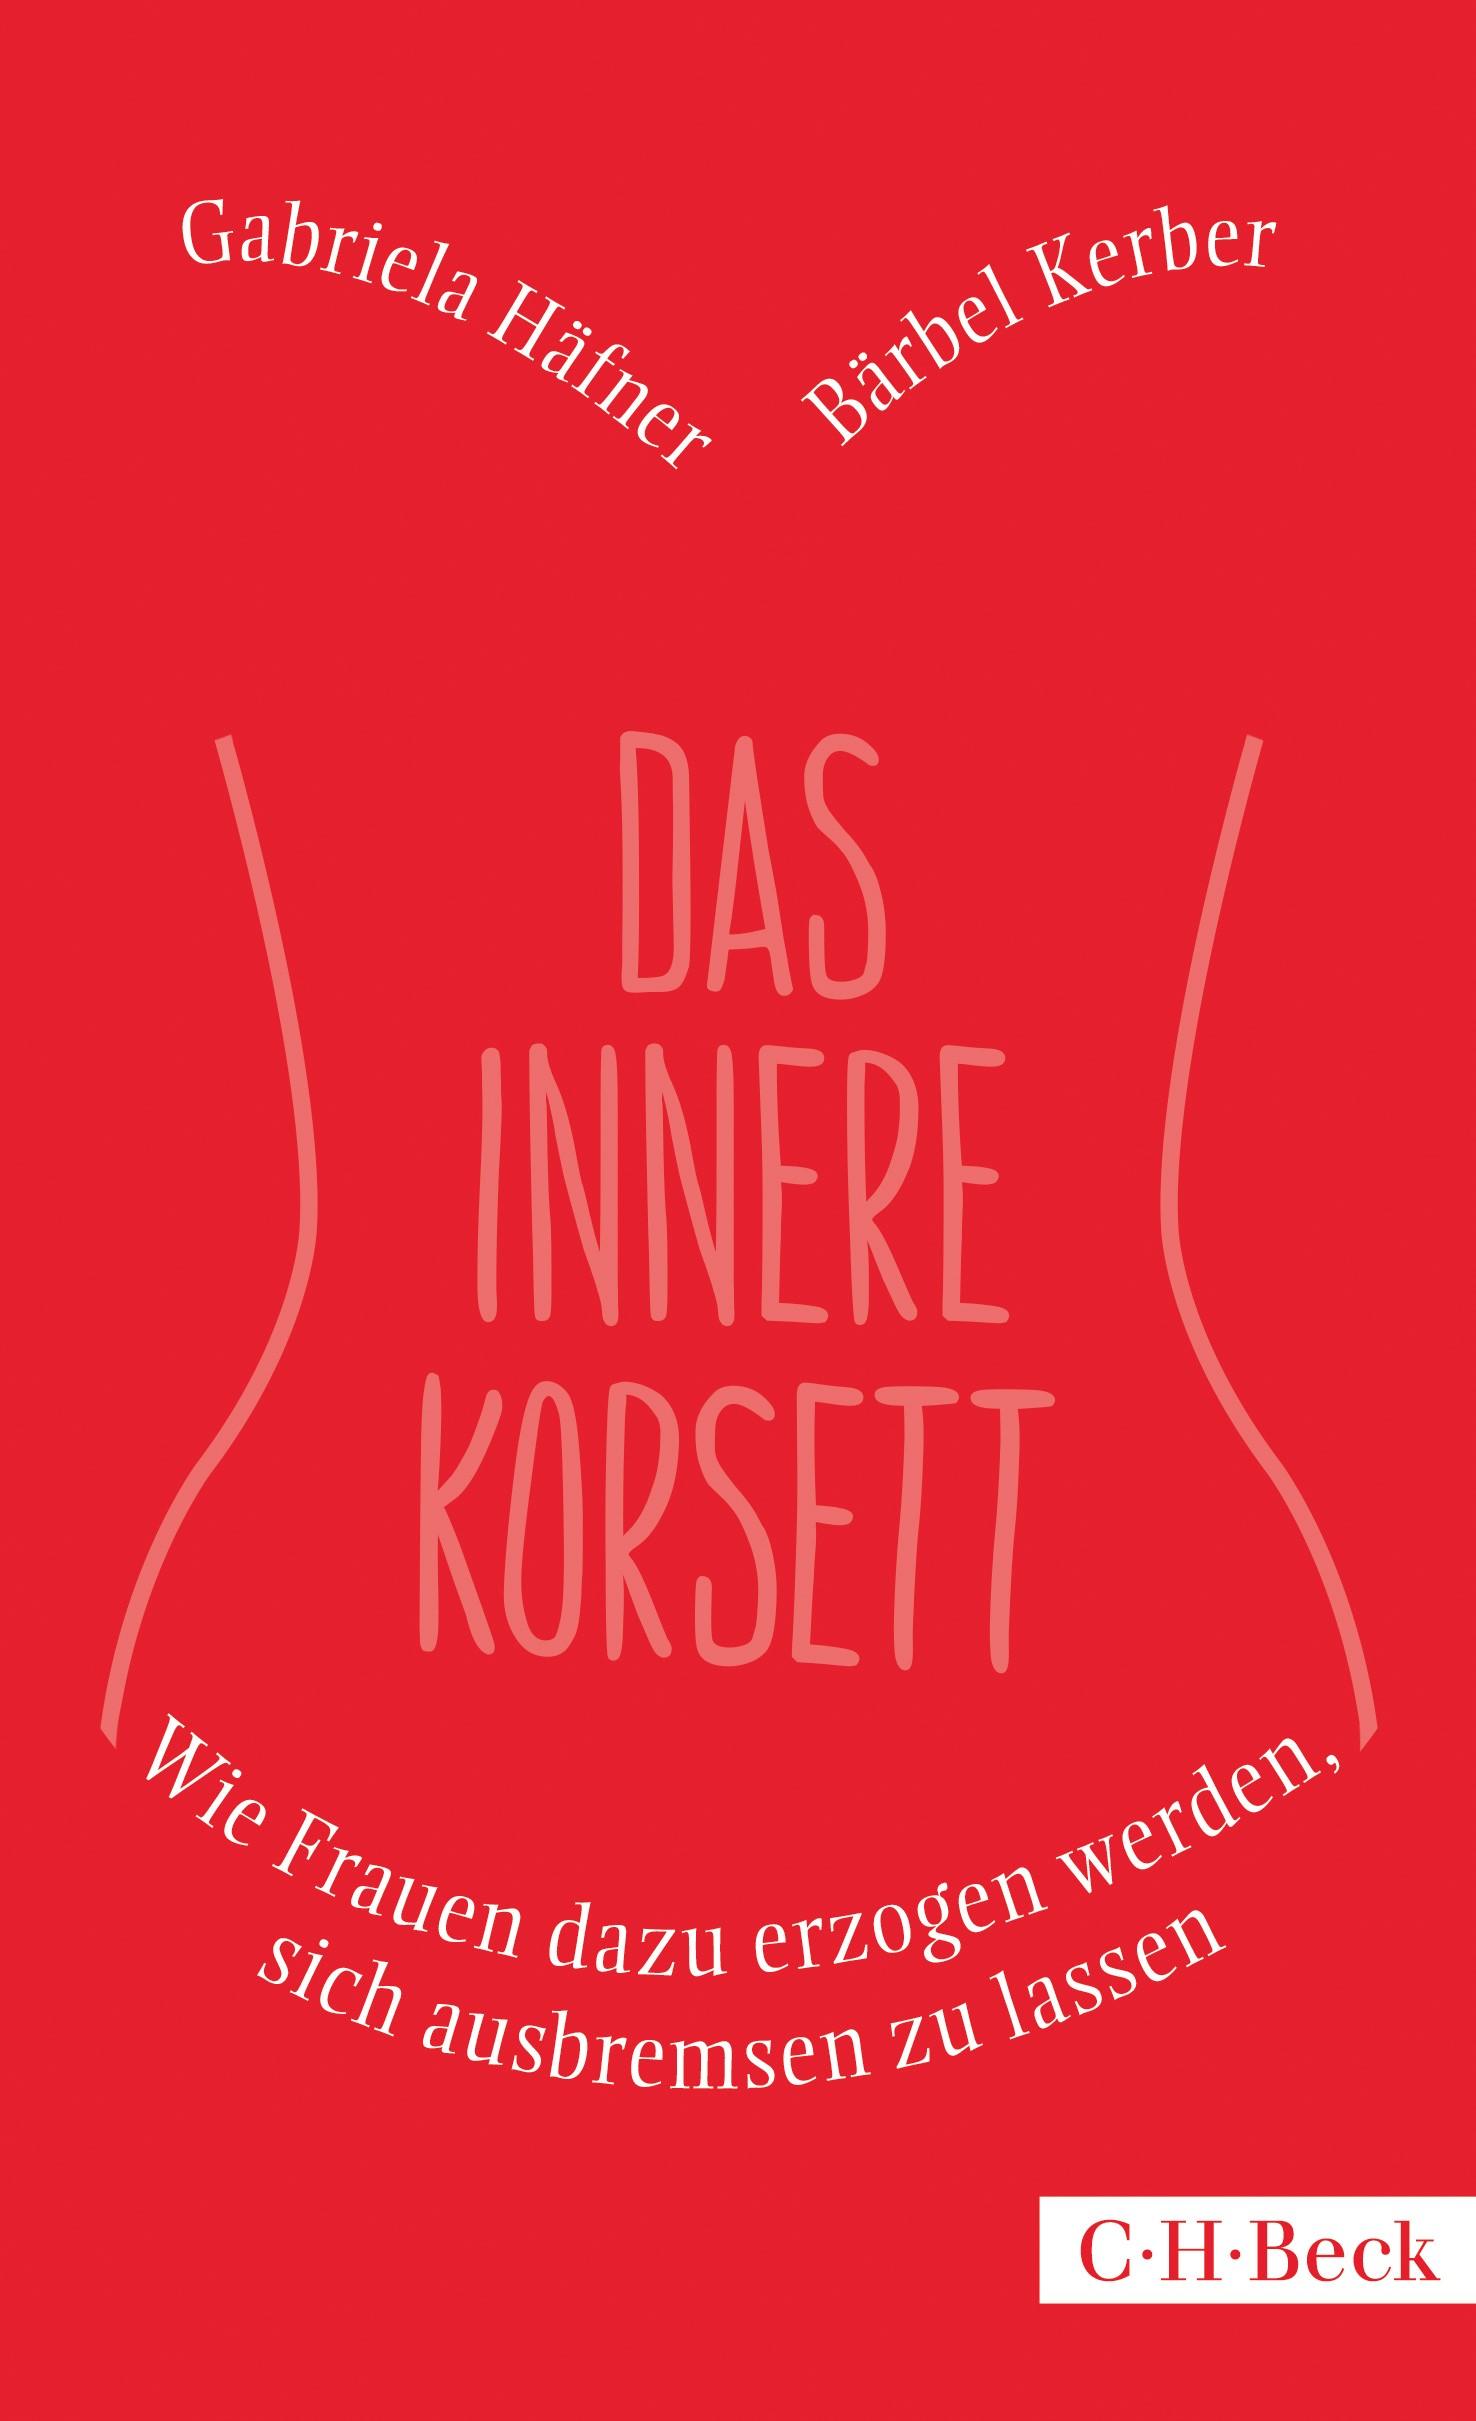 Cover des Buches 'Das innere Korsett'